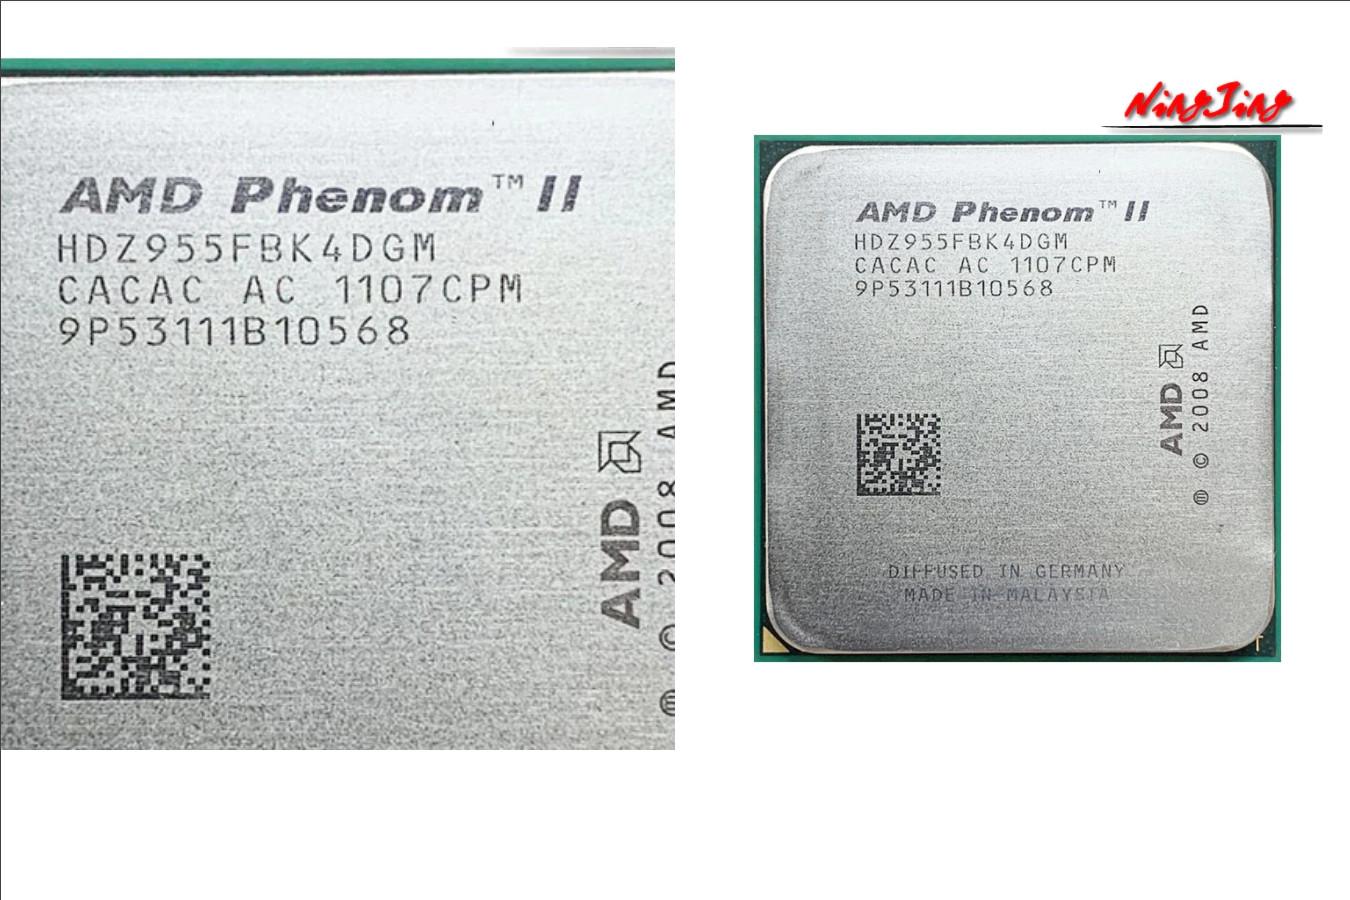 ЦПУ от производителя — AMD Phenom II X4 955